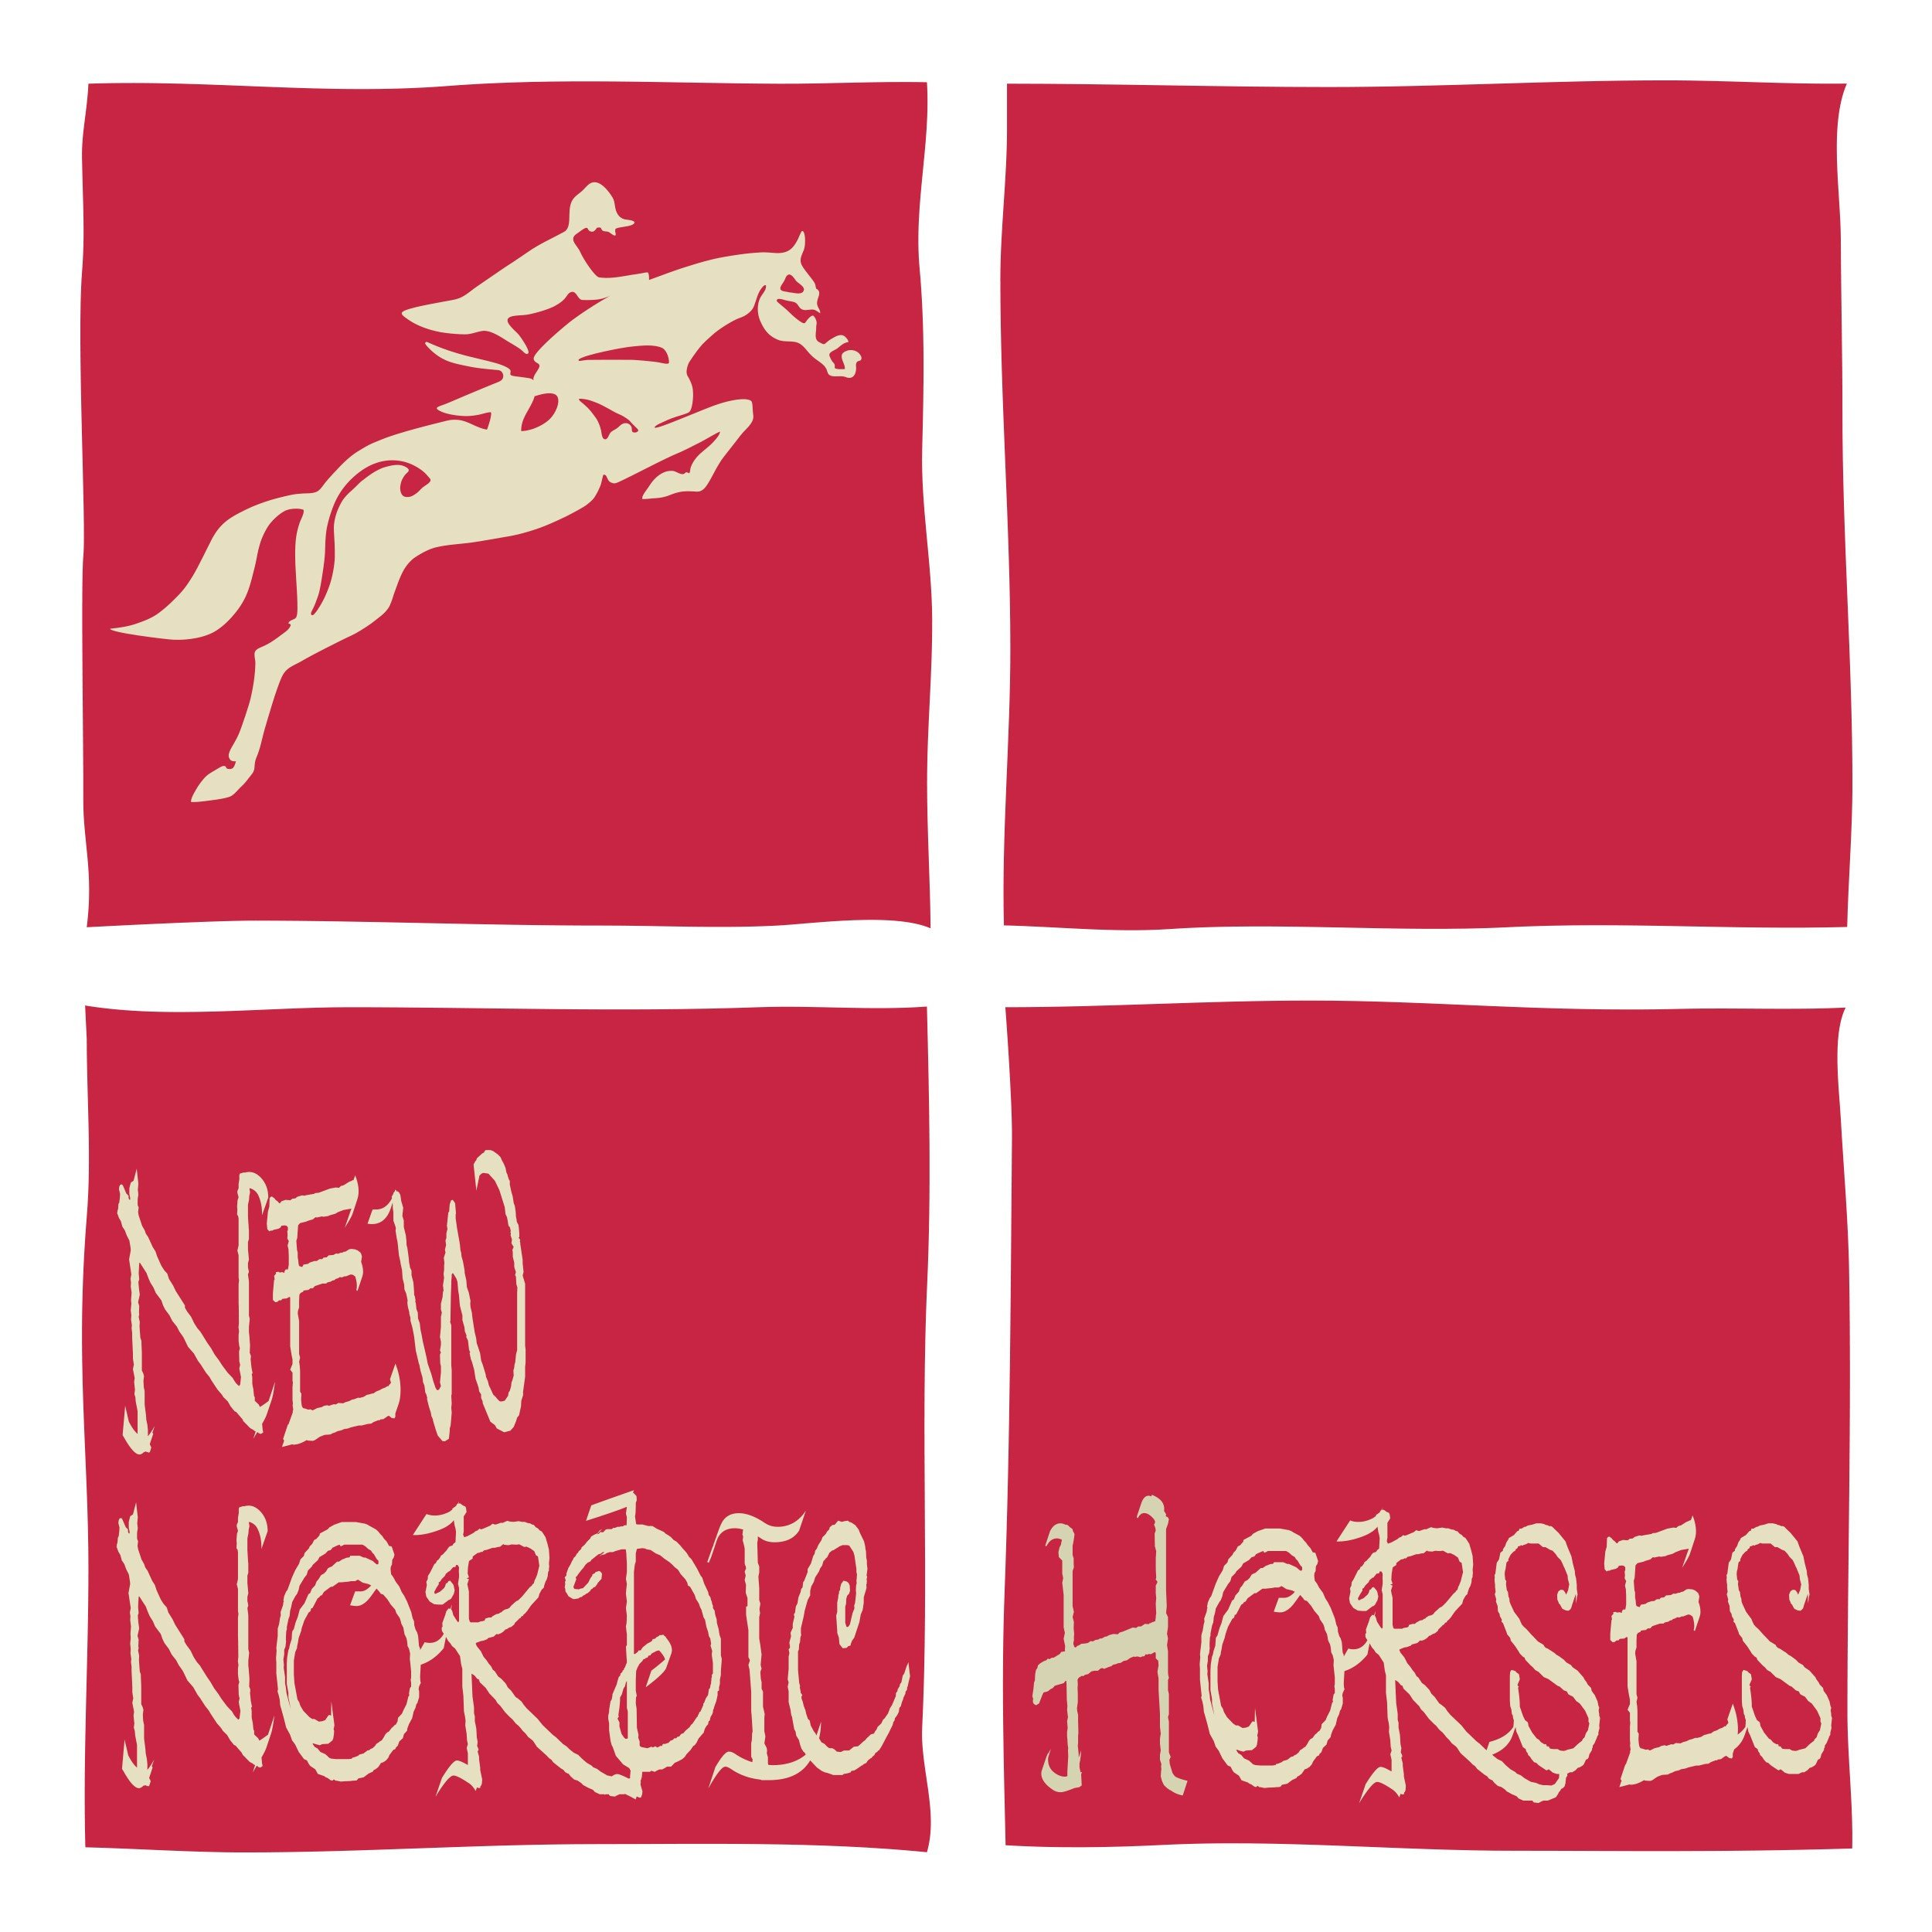 New-Nordic-Horses.jpg